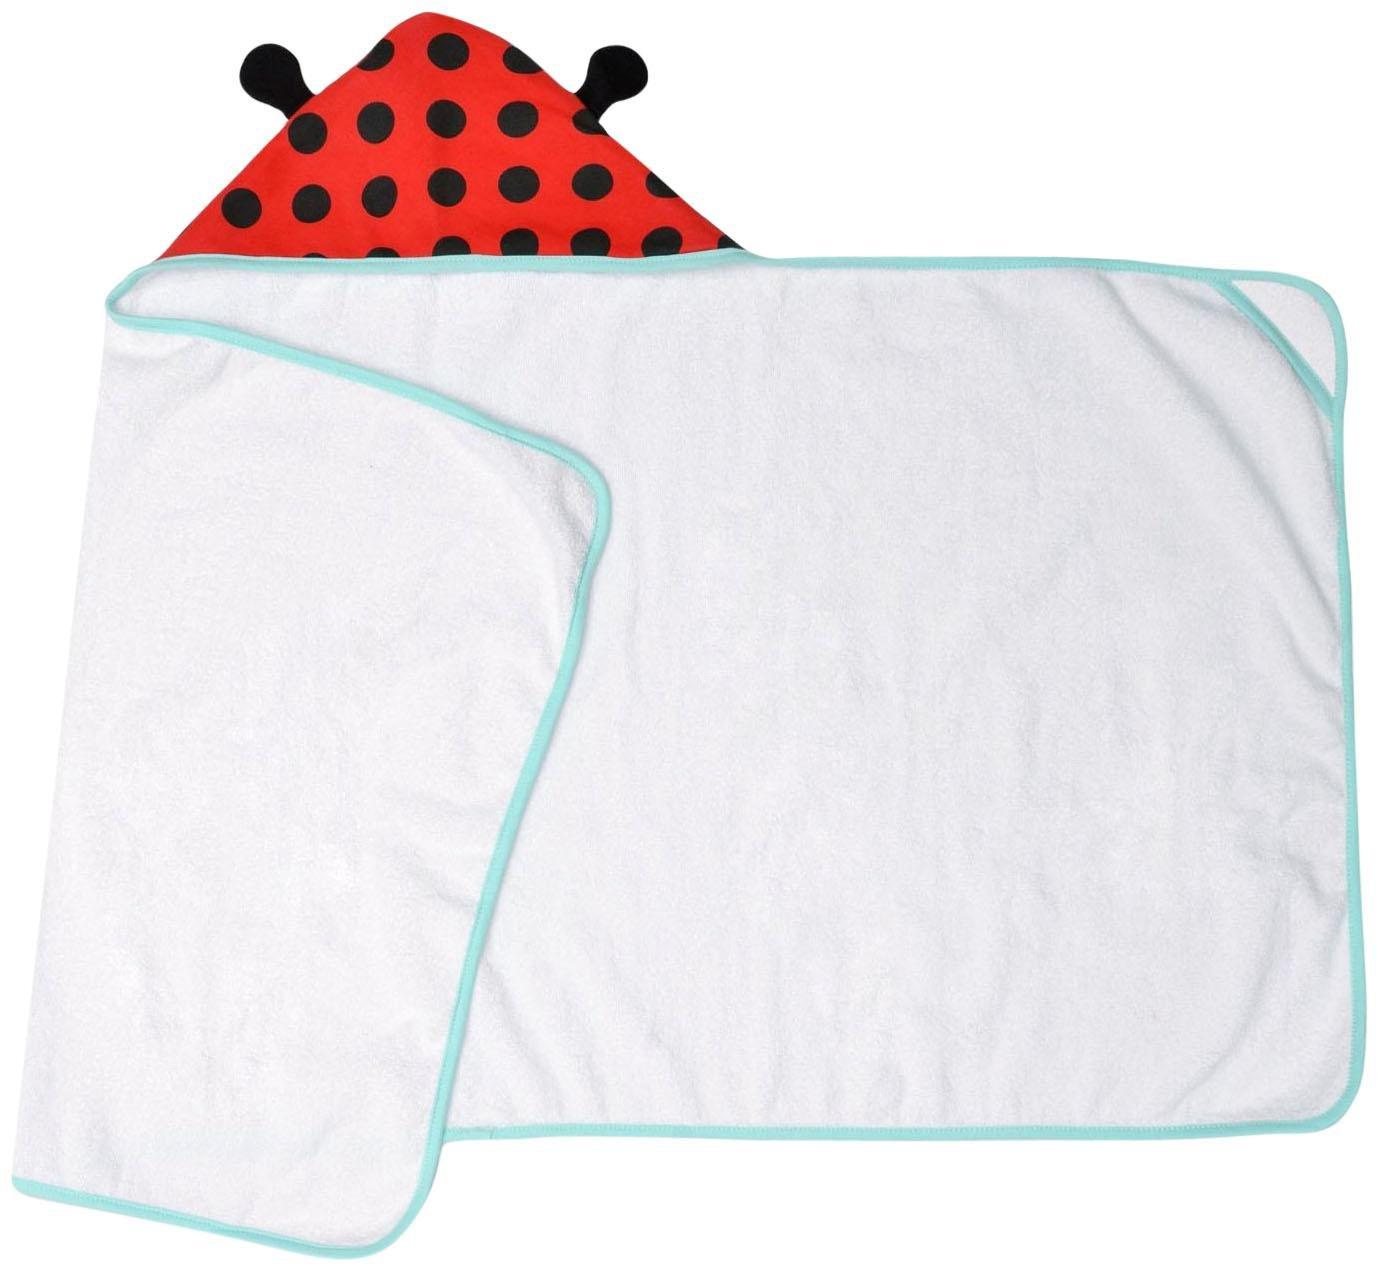 JJ Cole Hooded Towel - Lady Bug - 1 ct.